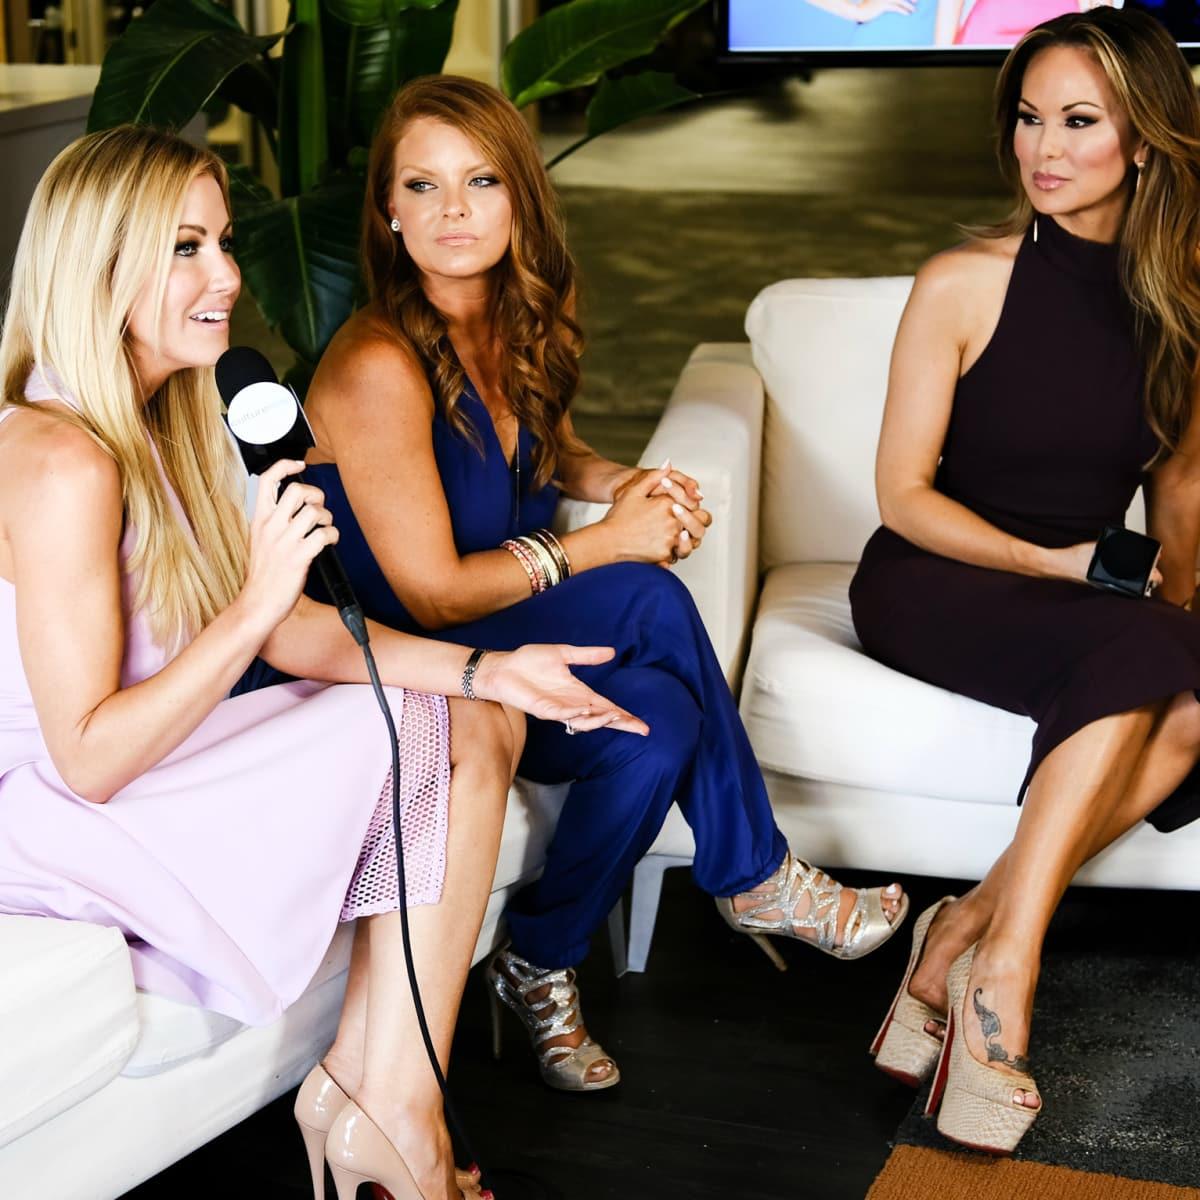 Real Housewives of Dallas Stephanie Hollman, Brandi Redmond, Tiffany Hendra